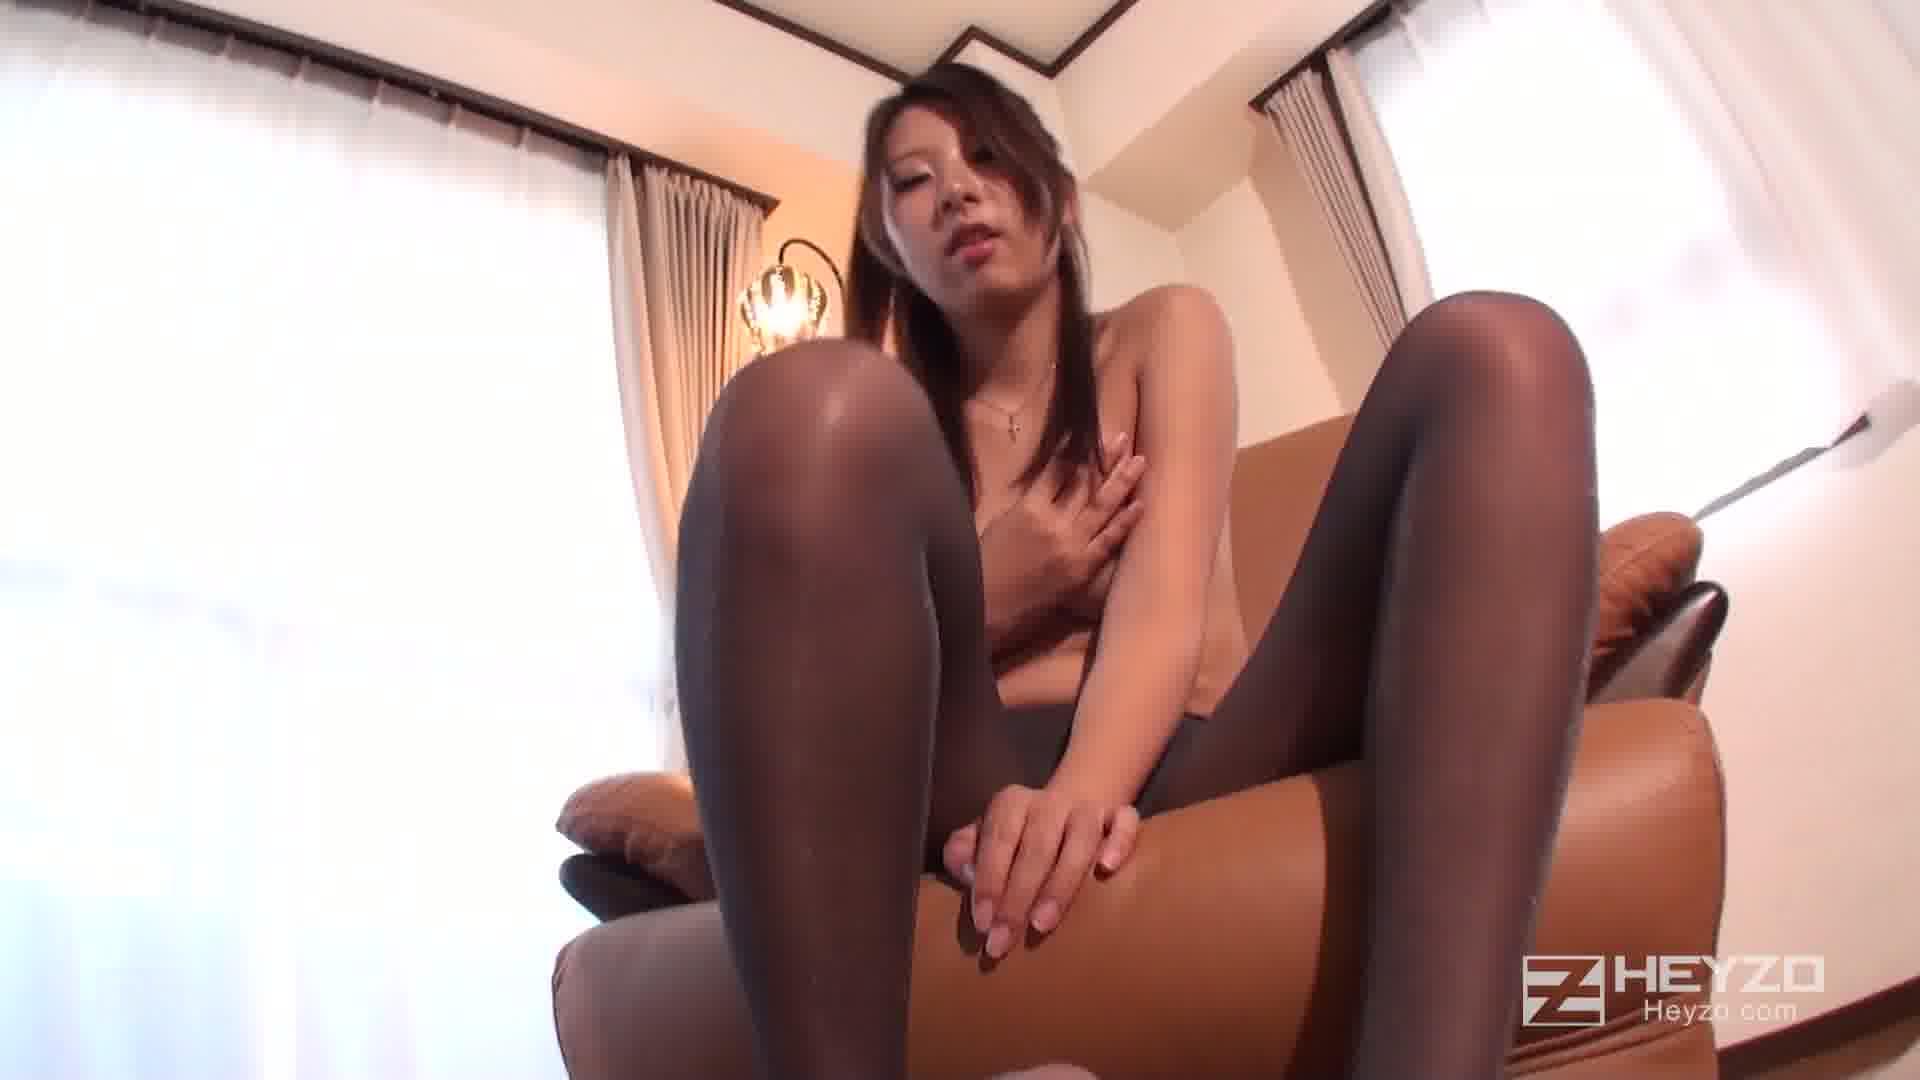 The 足フェチ~足コキ・足舐め・美脚エンジェル~ - 朝比奈舞【足コキ】